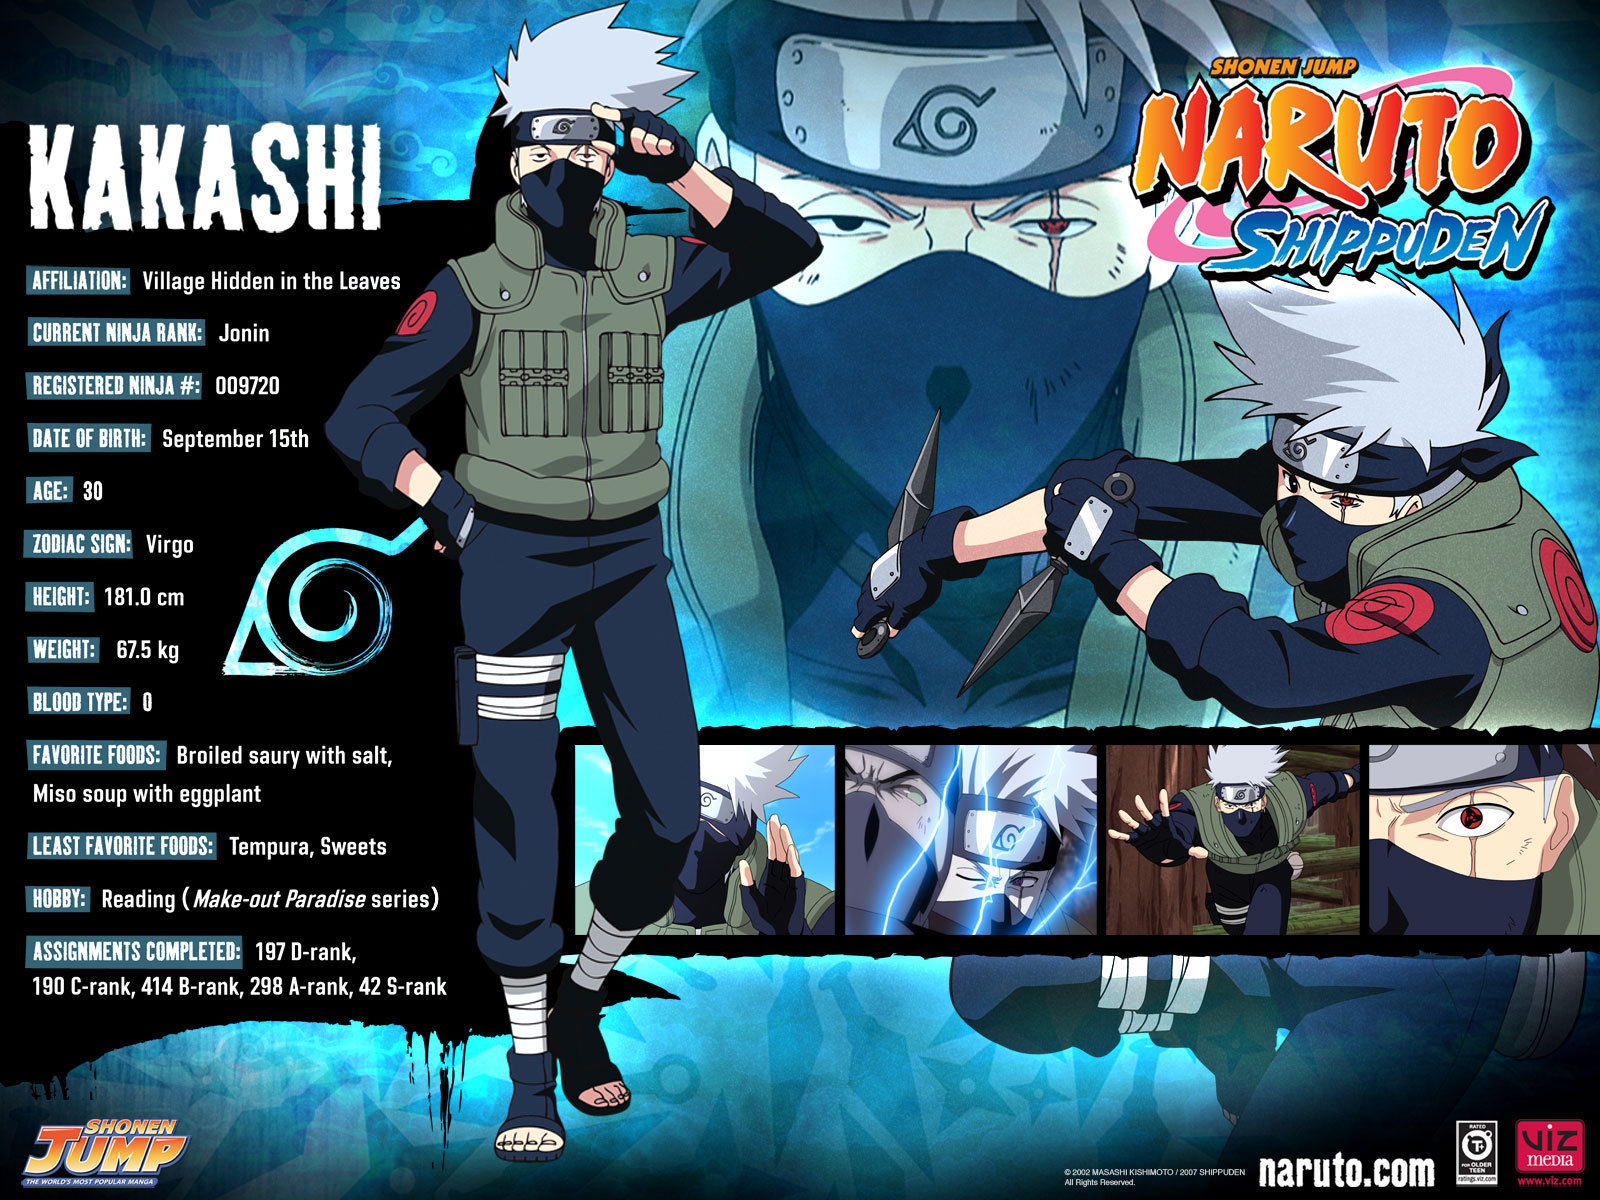 Naruto Shippuden Wallpaper Naruto Wallpaper is a hi res Wallpaper 1600x1200